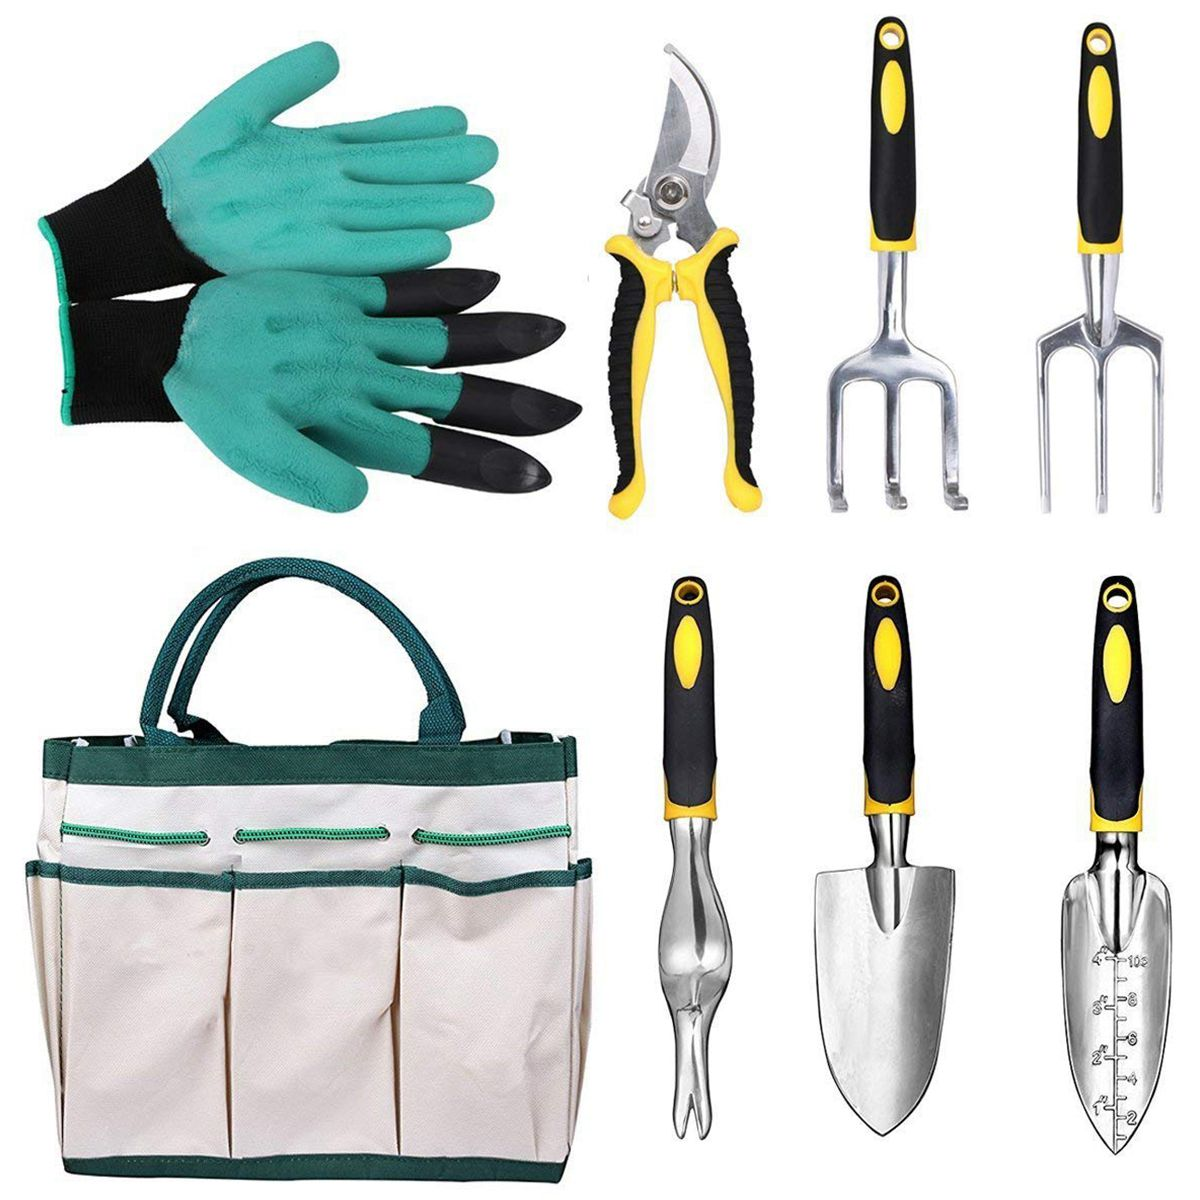 8 Pieces Aluminum Gardening Tools Garden Kit Hand Tools Transplanter Trowel Pruner Rake Cultivator Garden Genie Gloves Tool Set